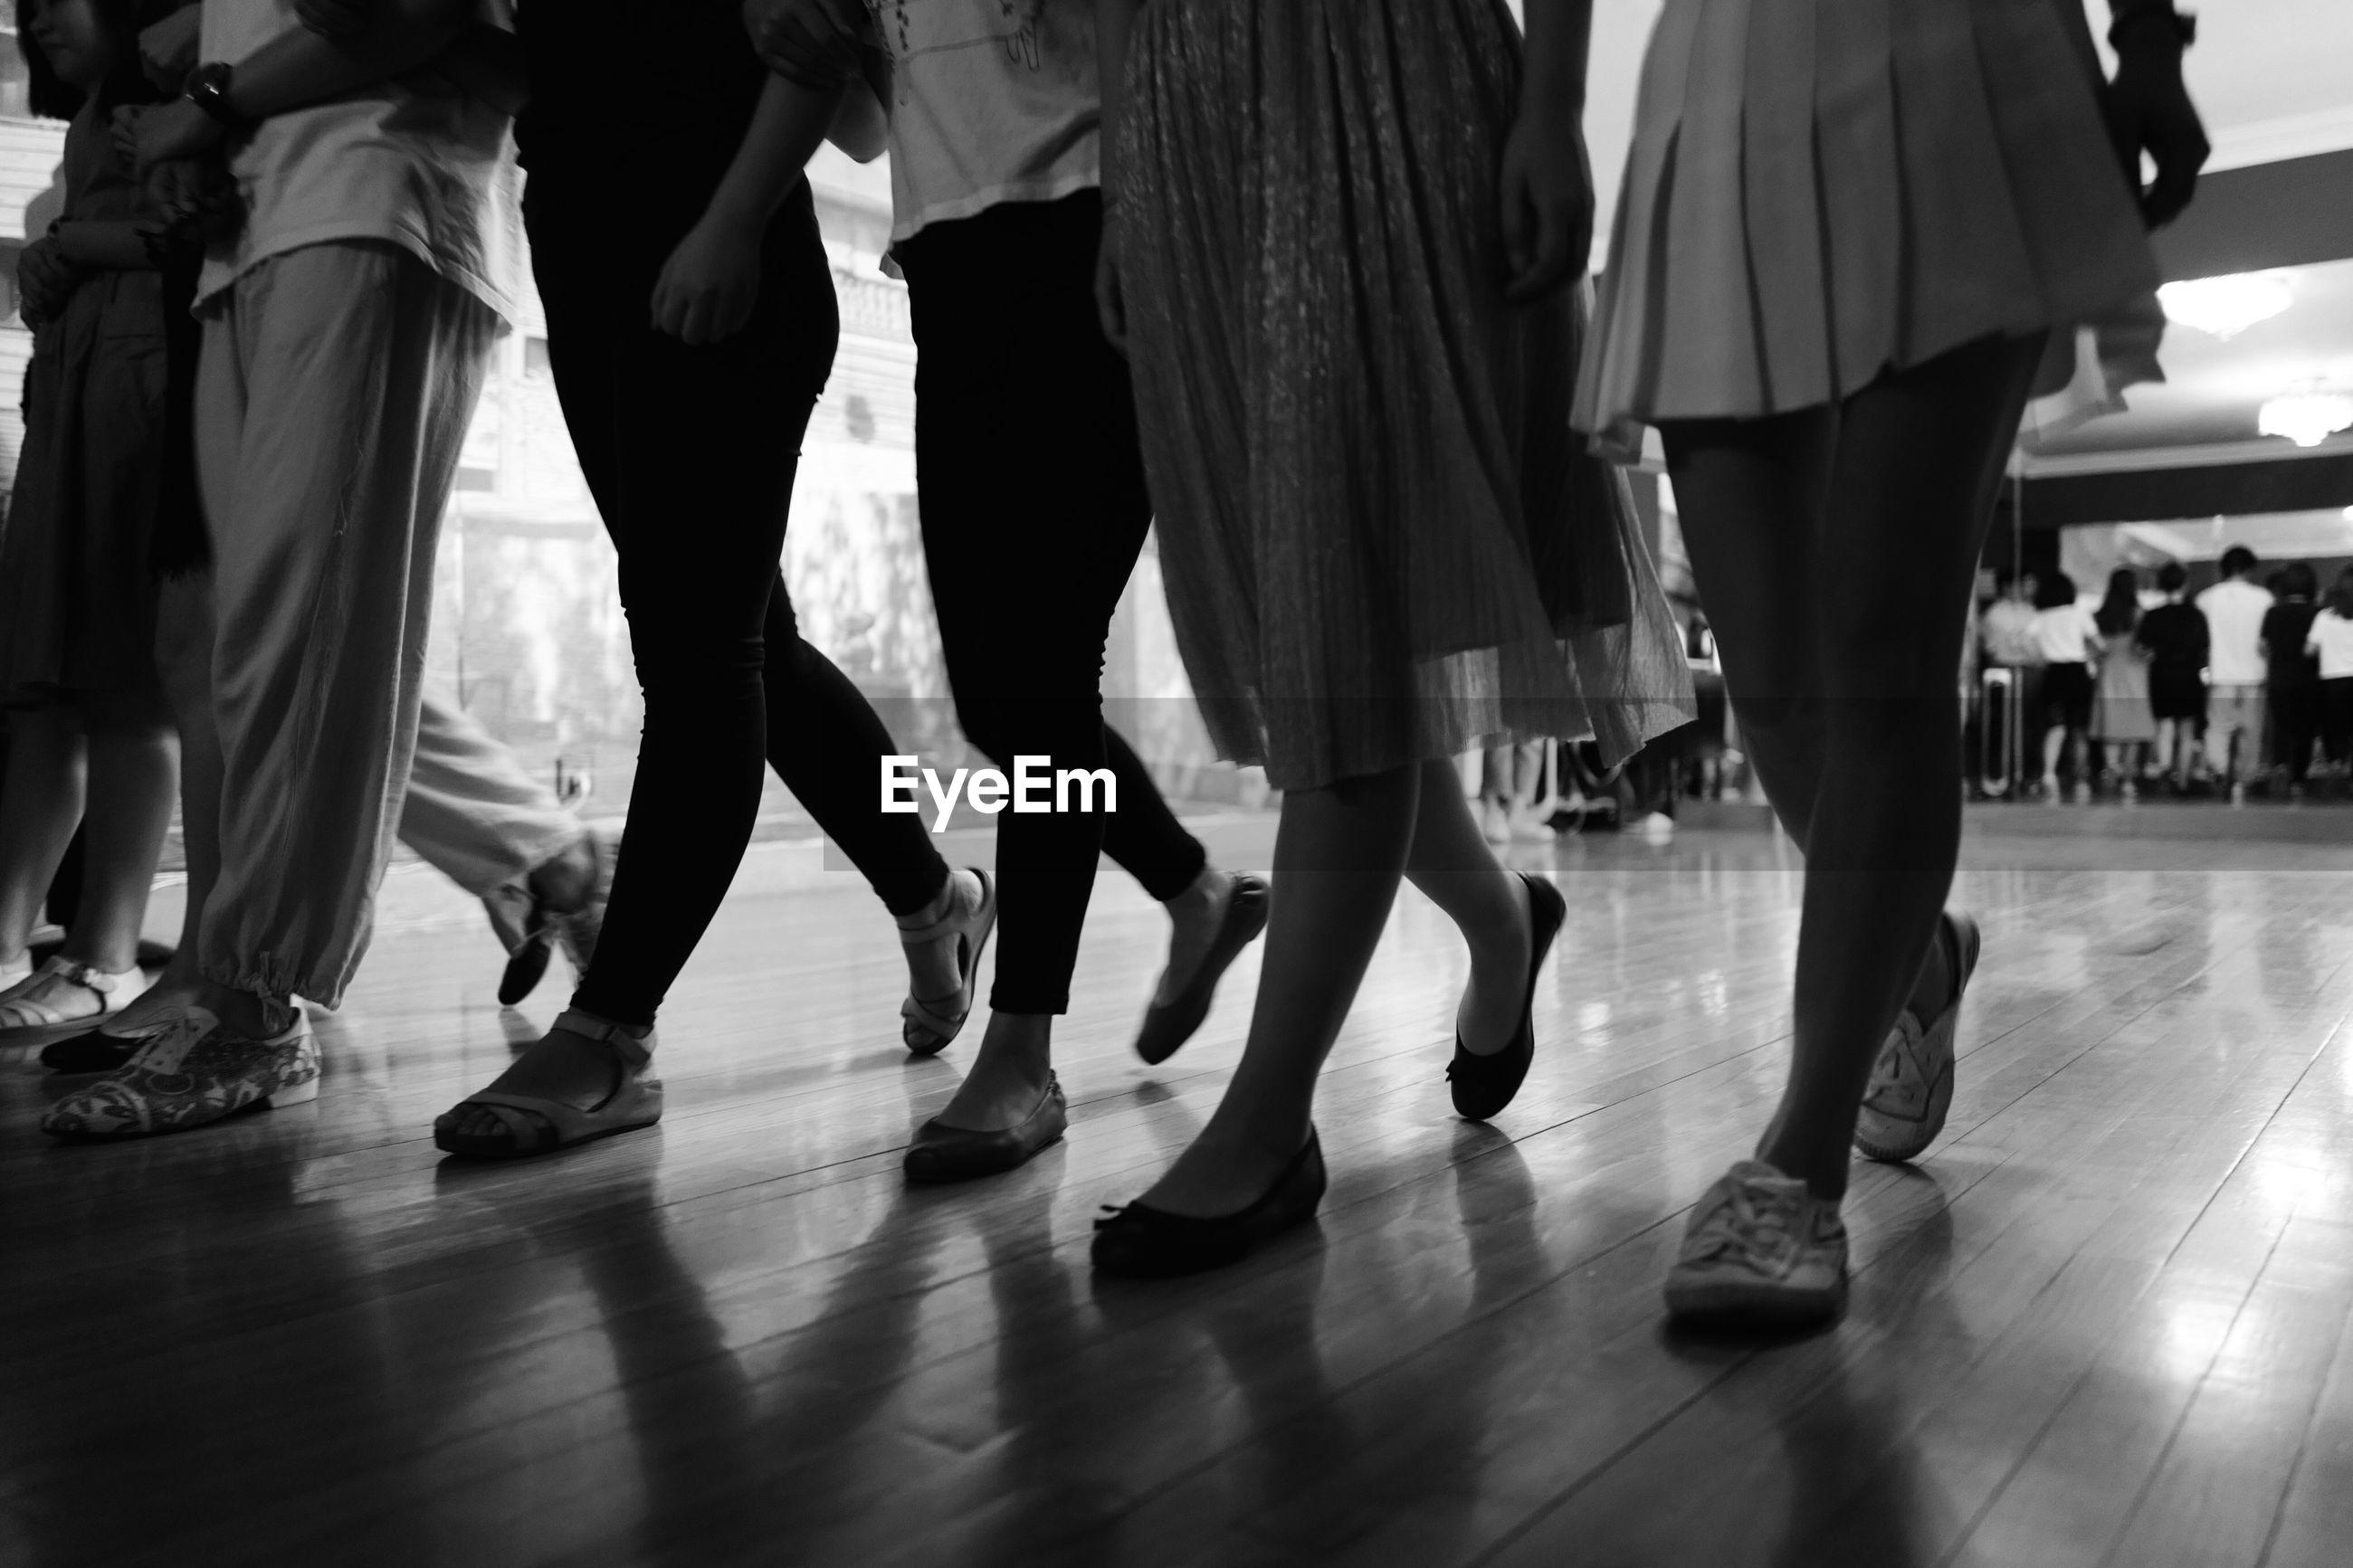 Low section of people dancing on hardwood floor